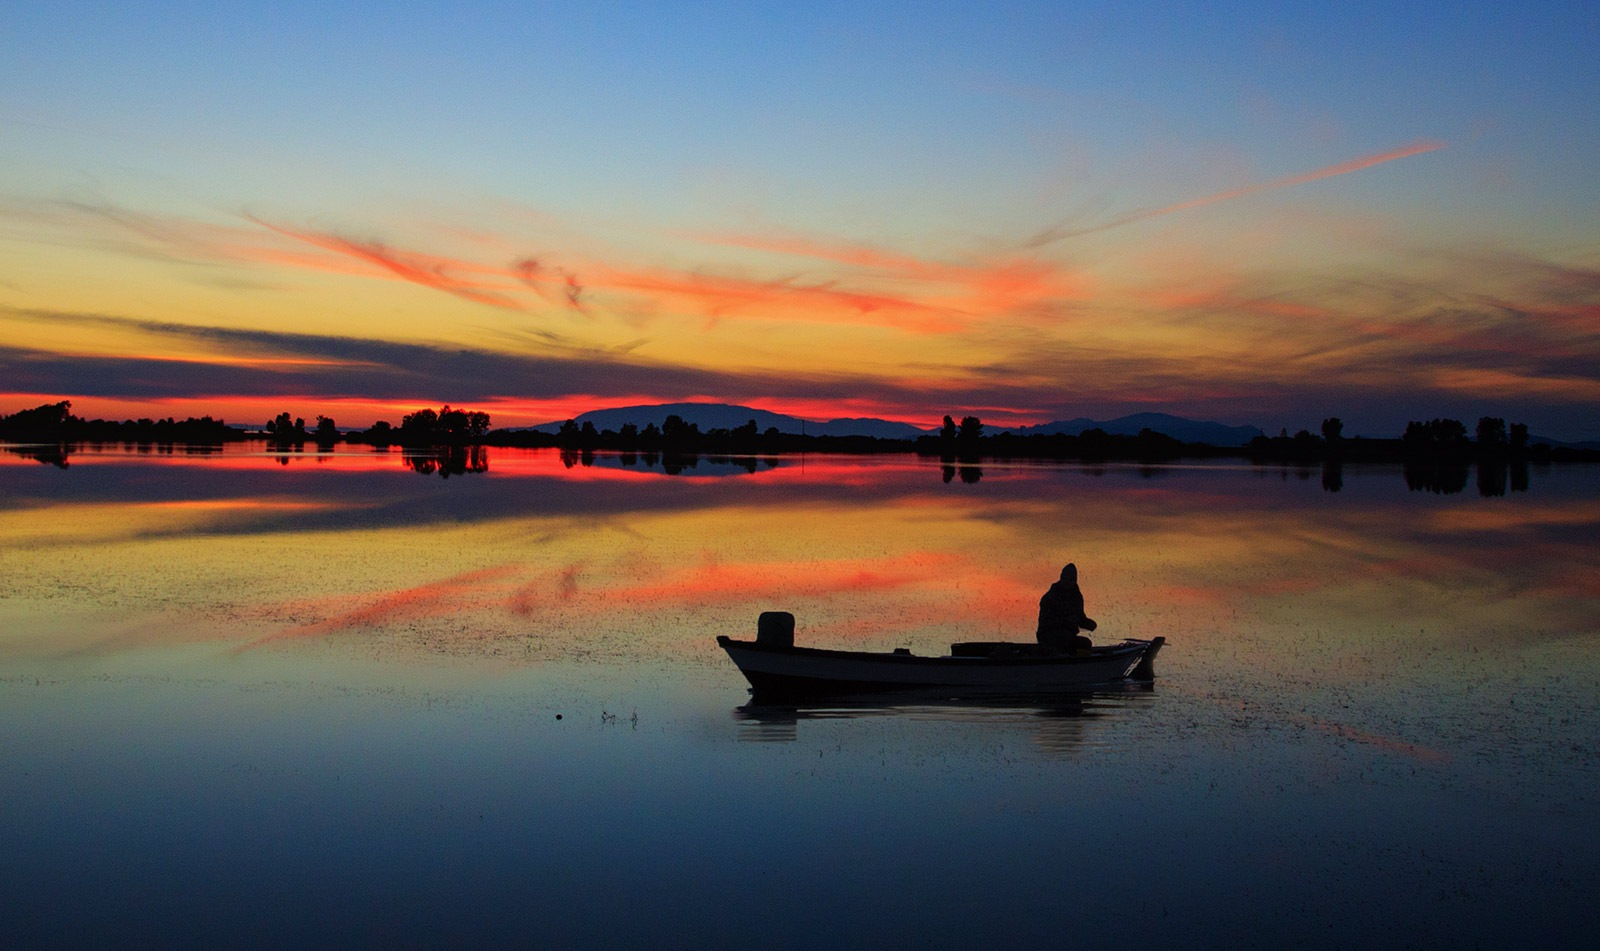 Throwing Fishing Net by Sotiris Siomis